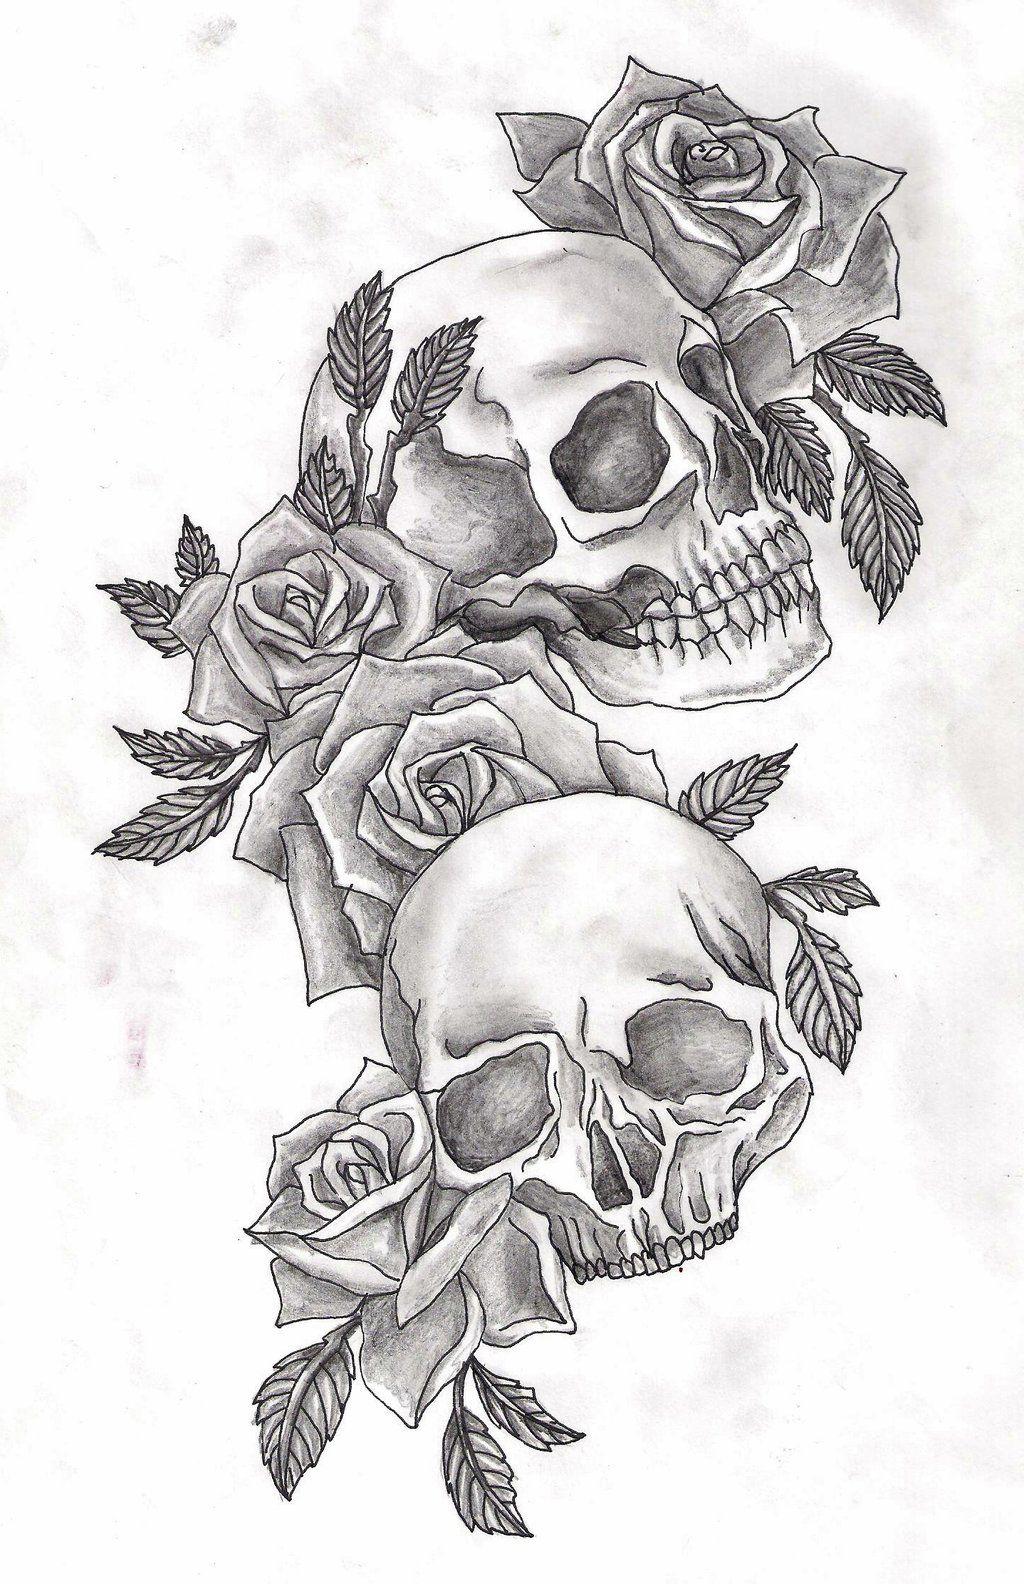 Another Idea For My Next Tattoo Skull Rose Tattoos Tattoo Designs Men Tattoo Design Drawings